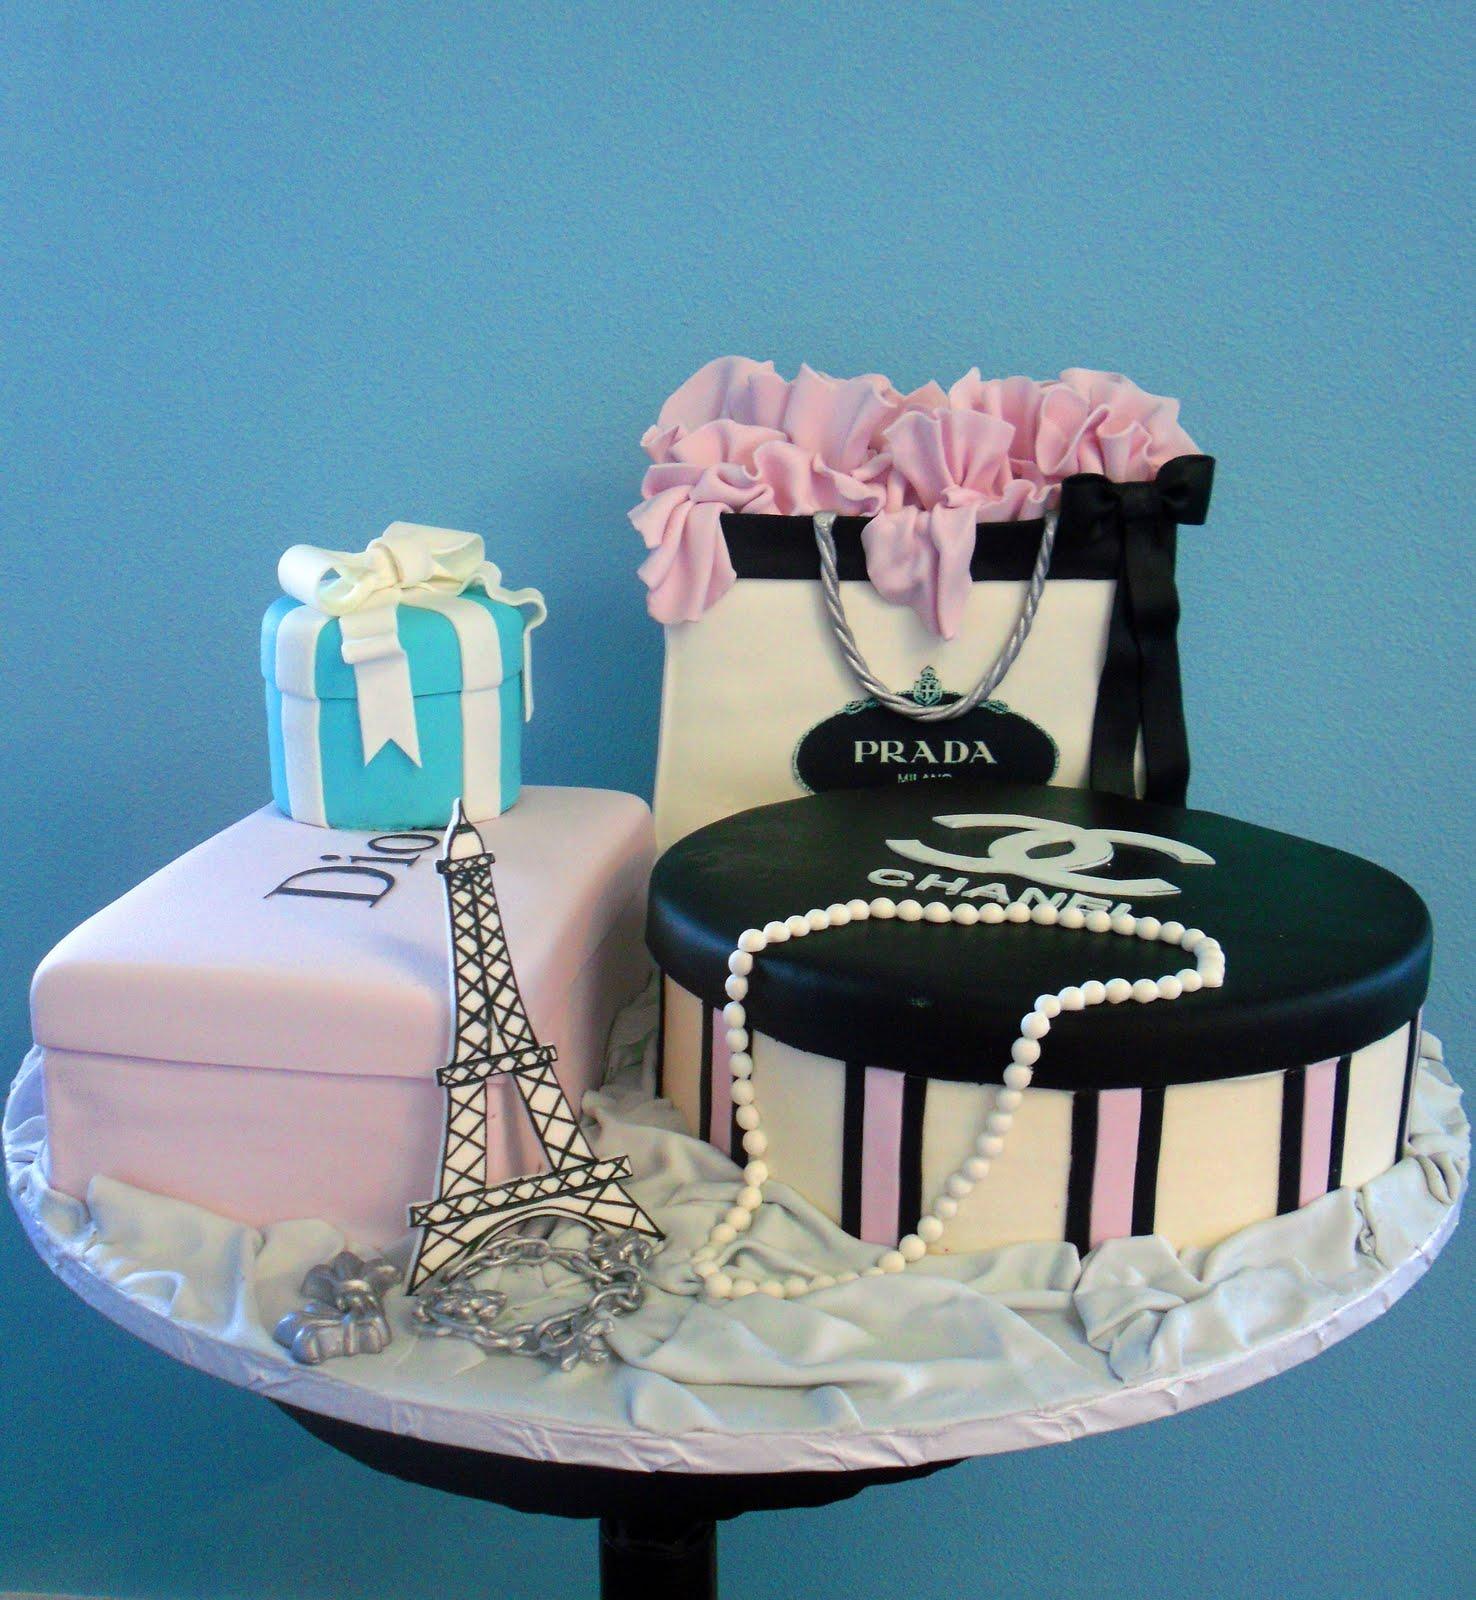 Dior Cake Designs